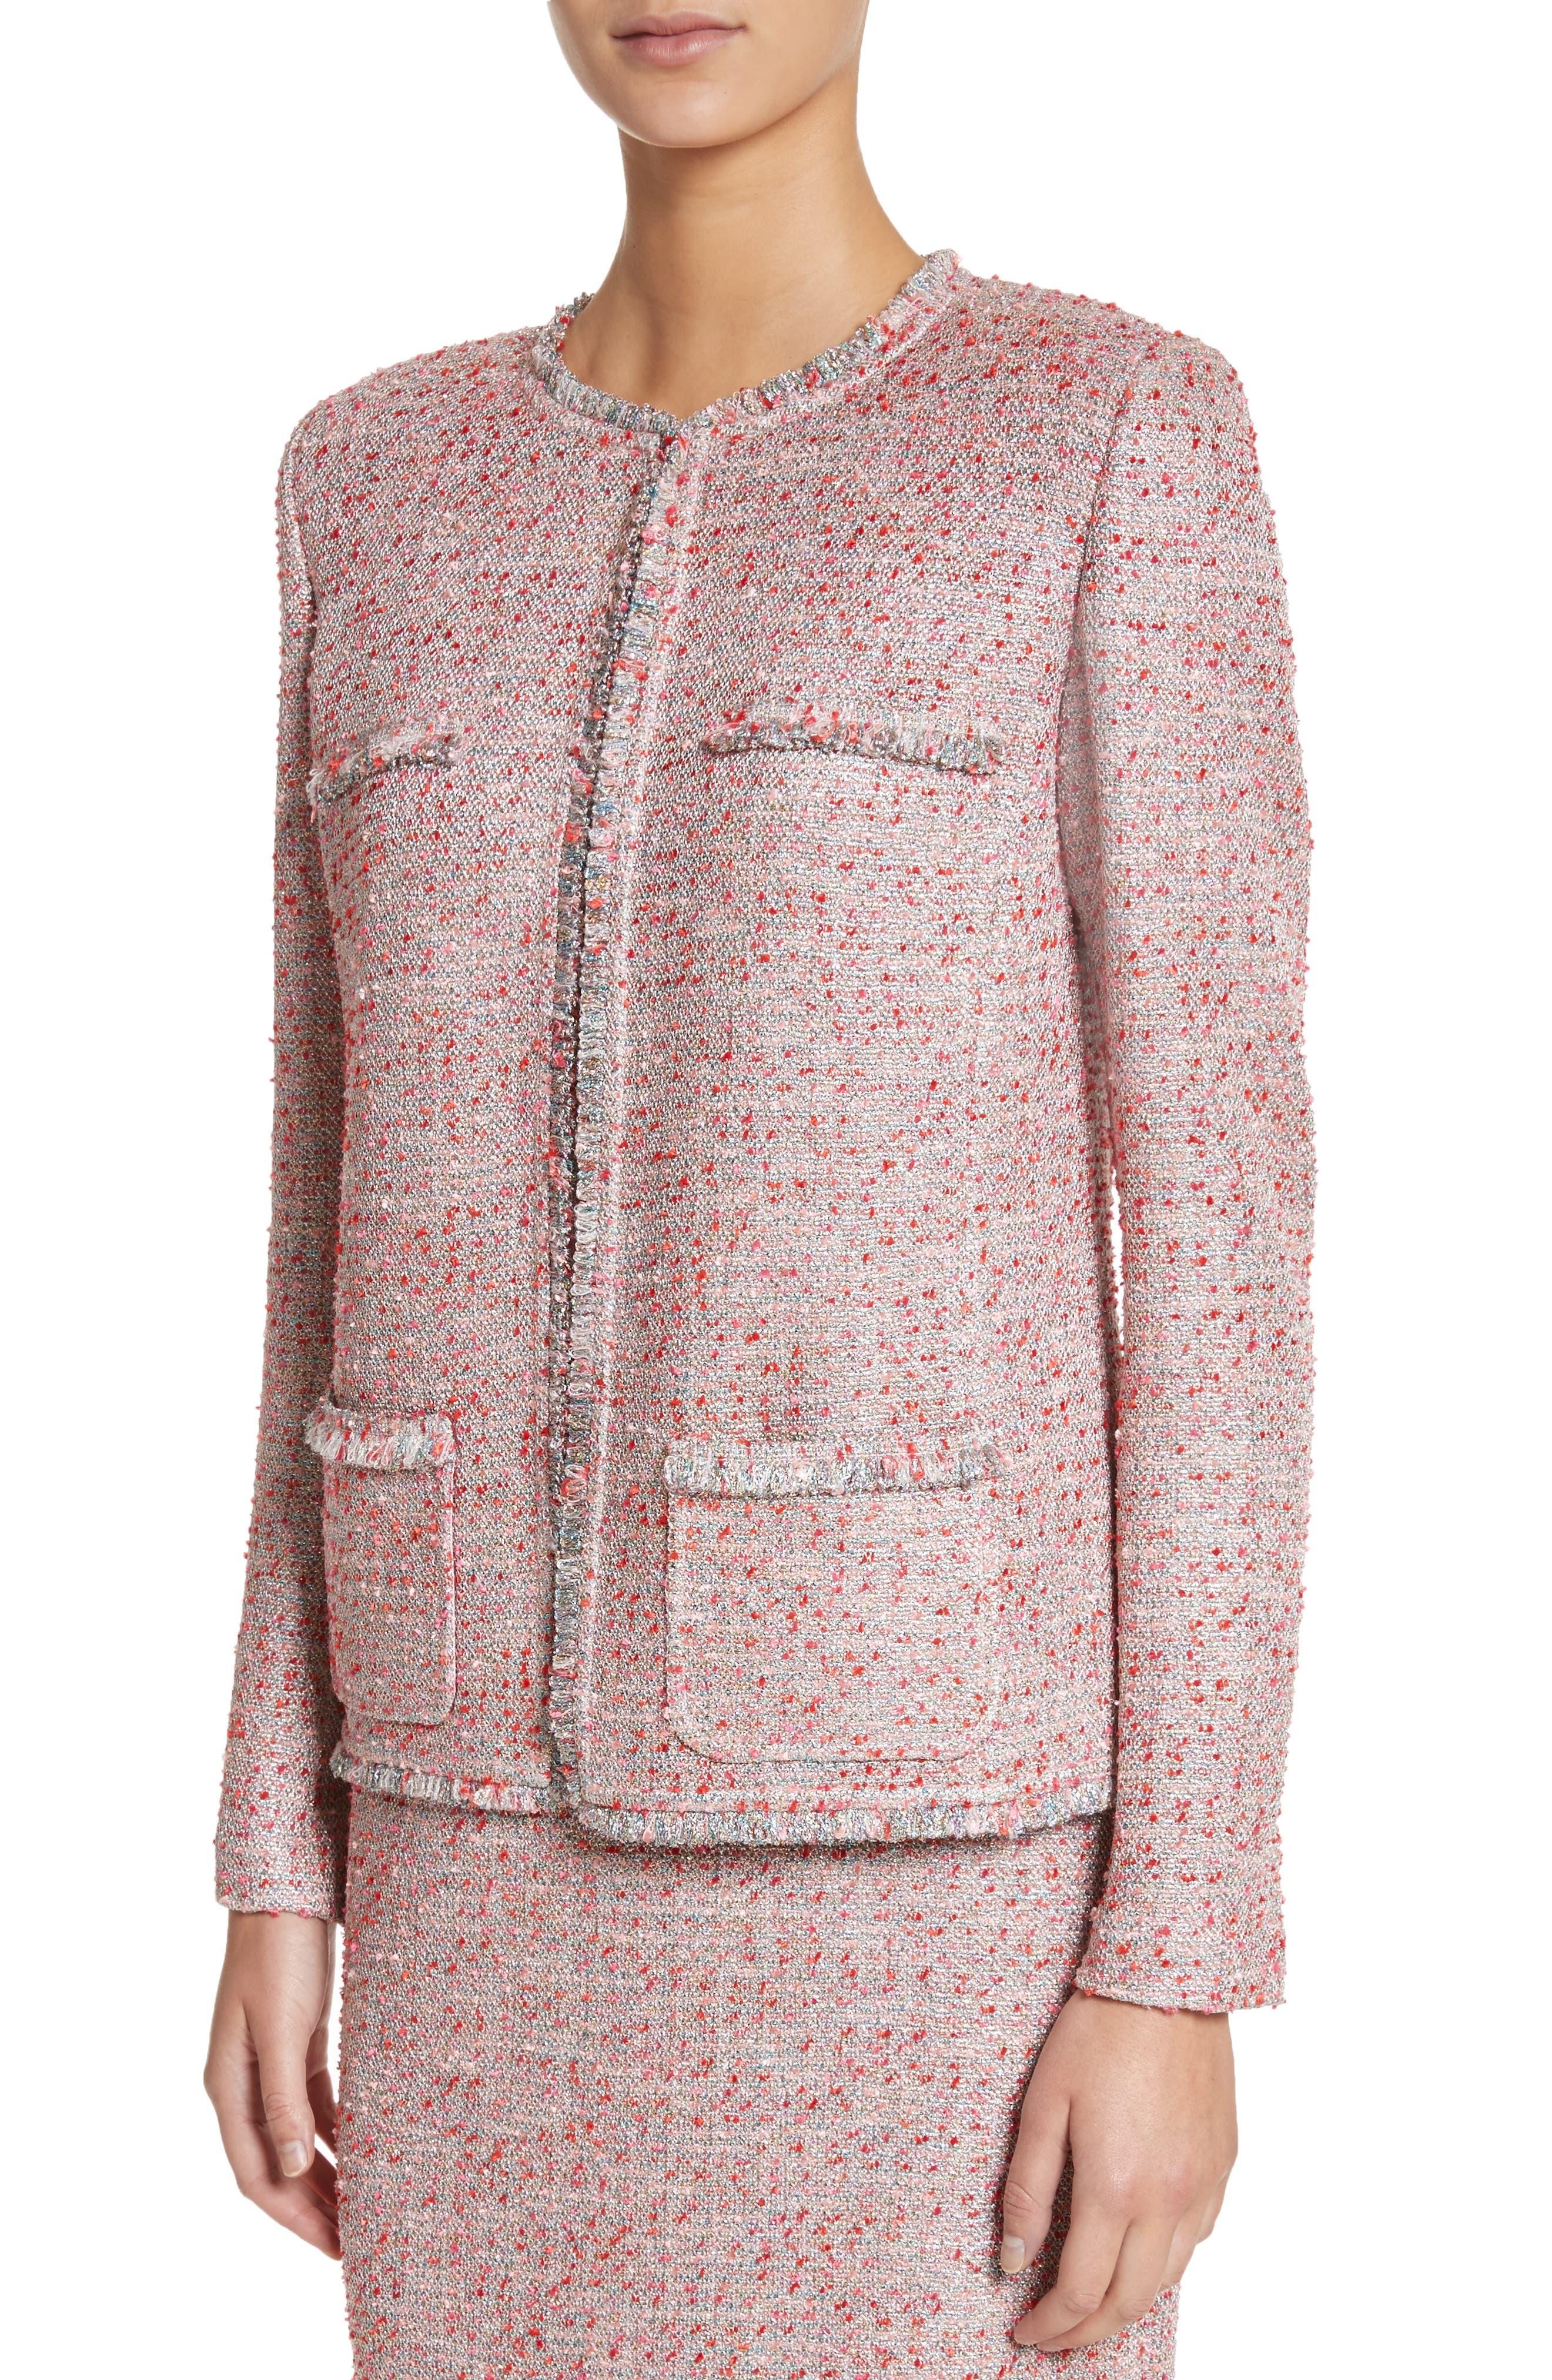 Metallic Tweed Jacket,                             Alternate thumbnail 4, color,                             660